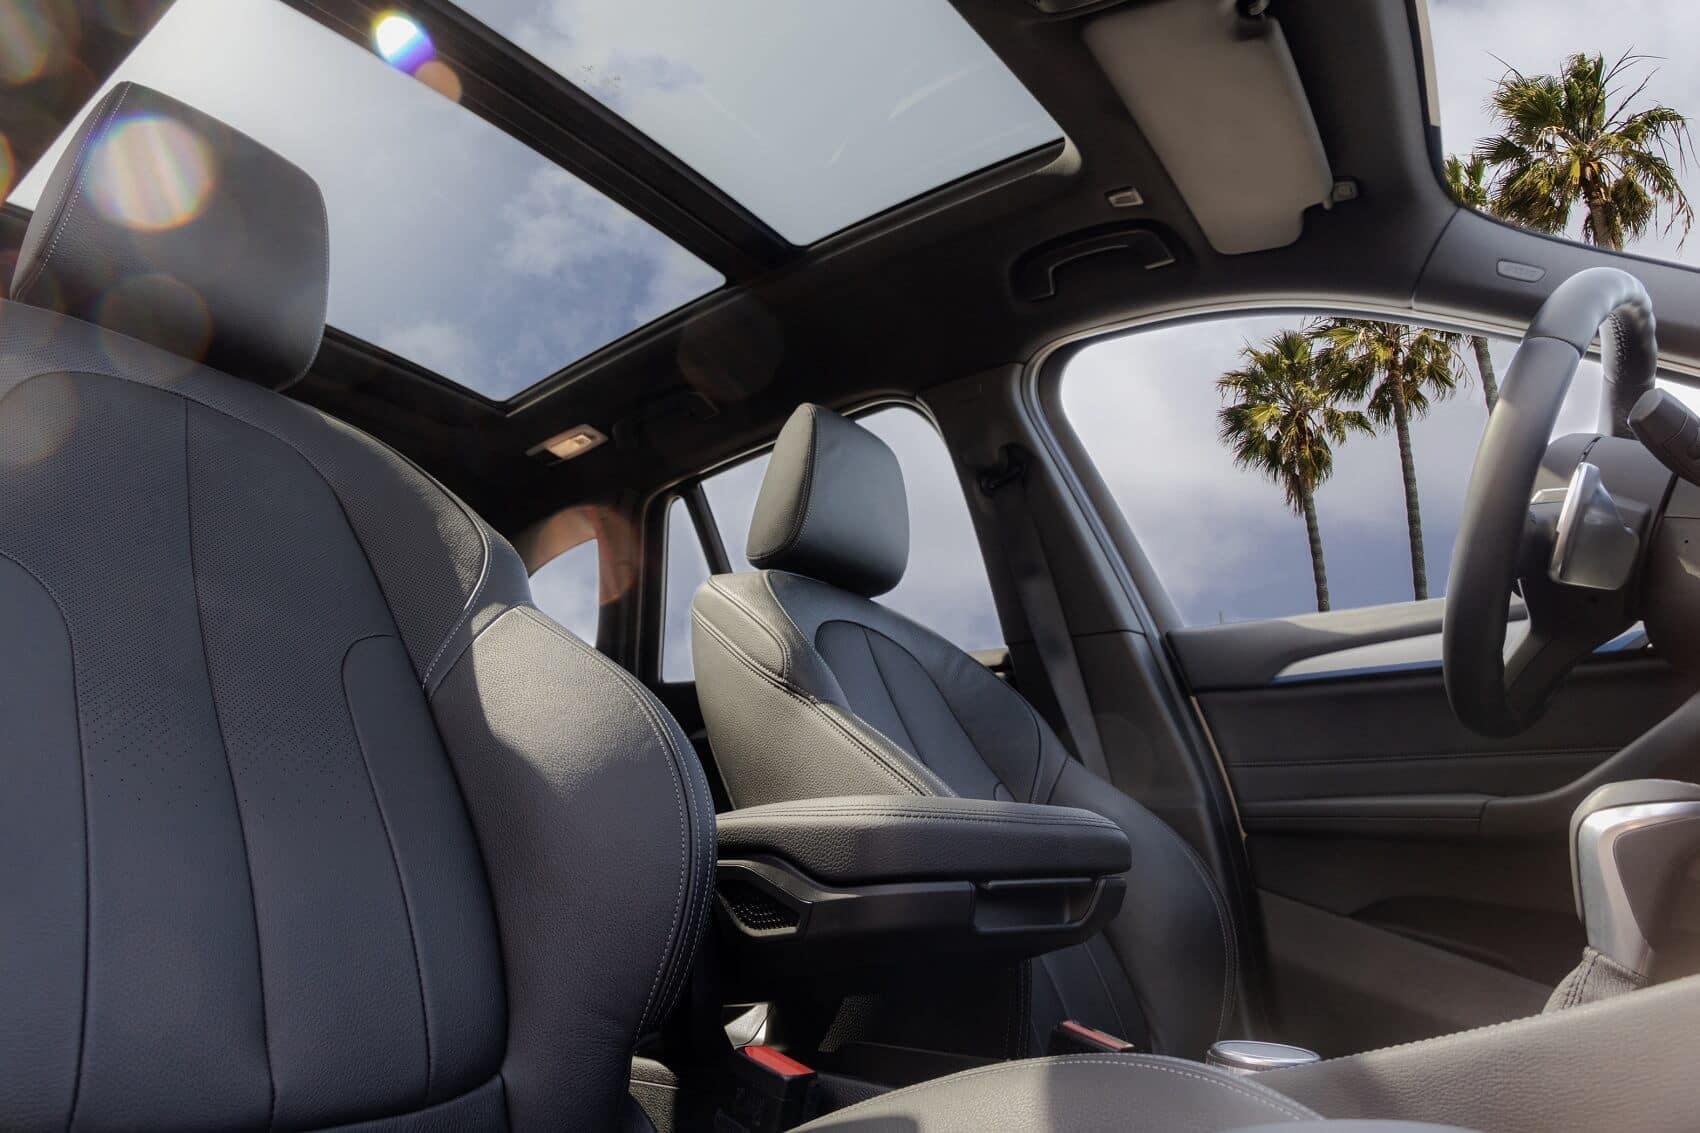 BMW X1 Interior New Rochelle NY